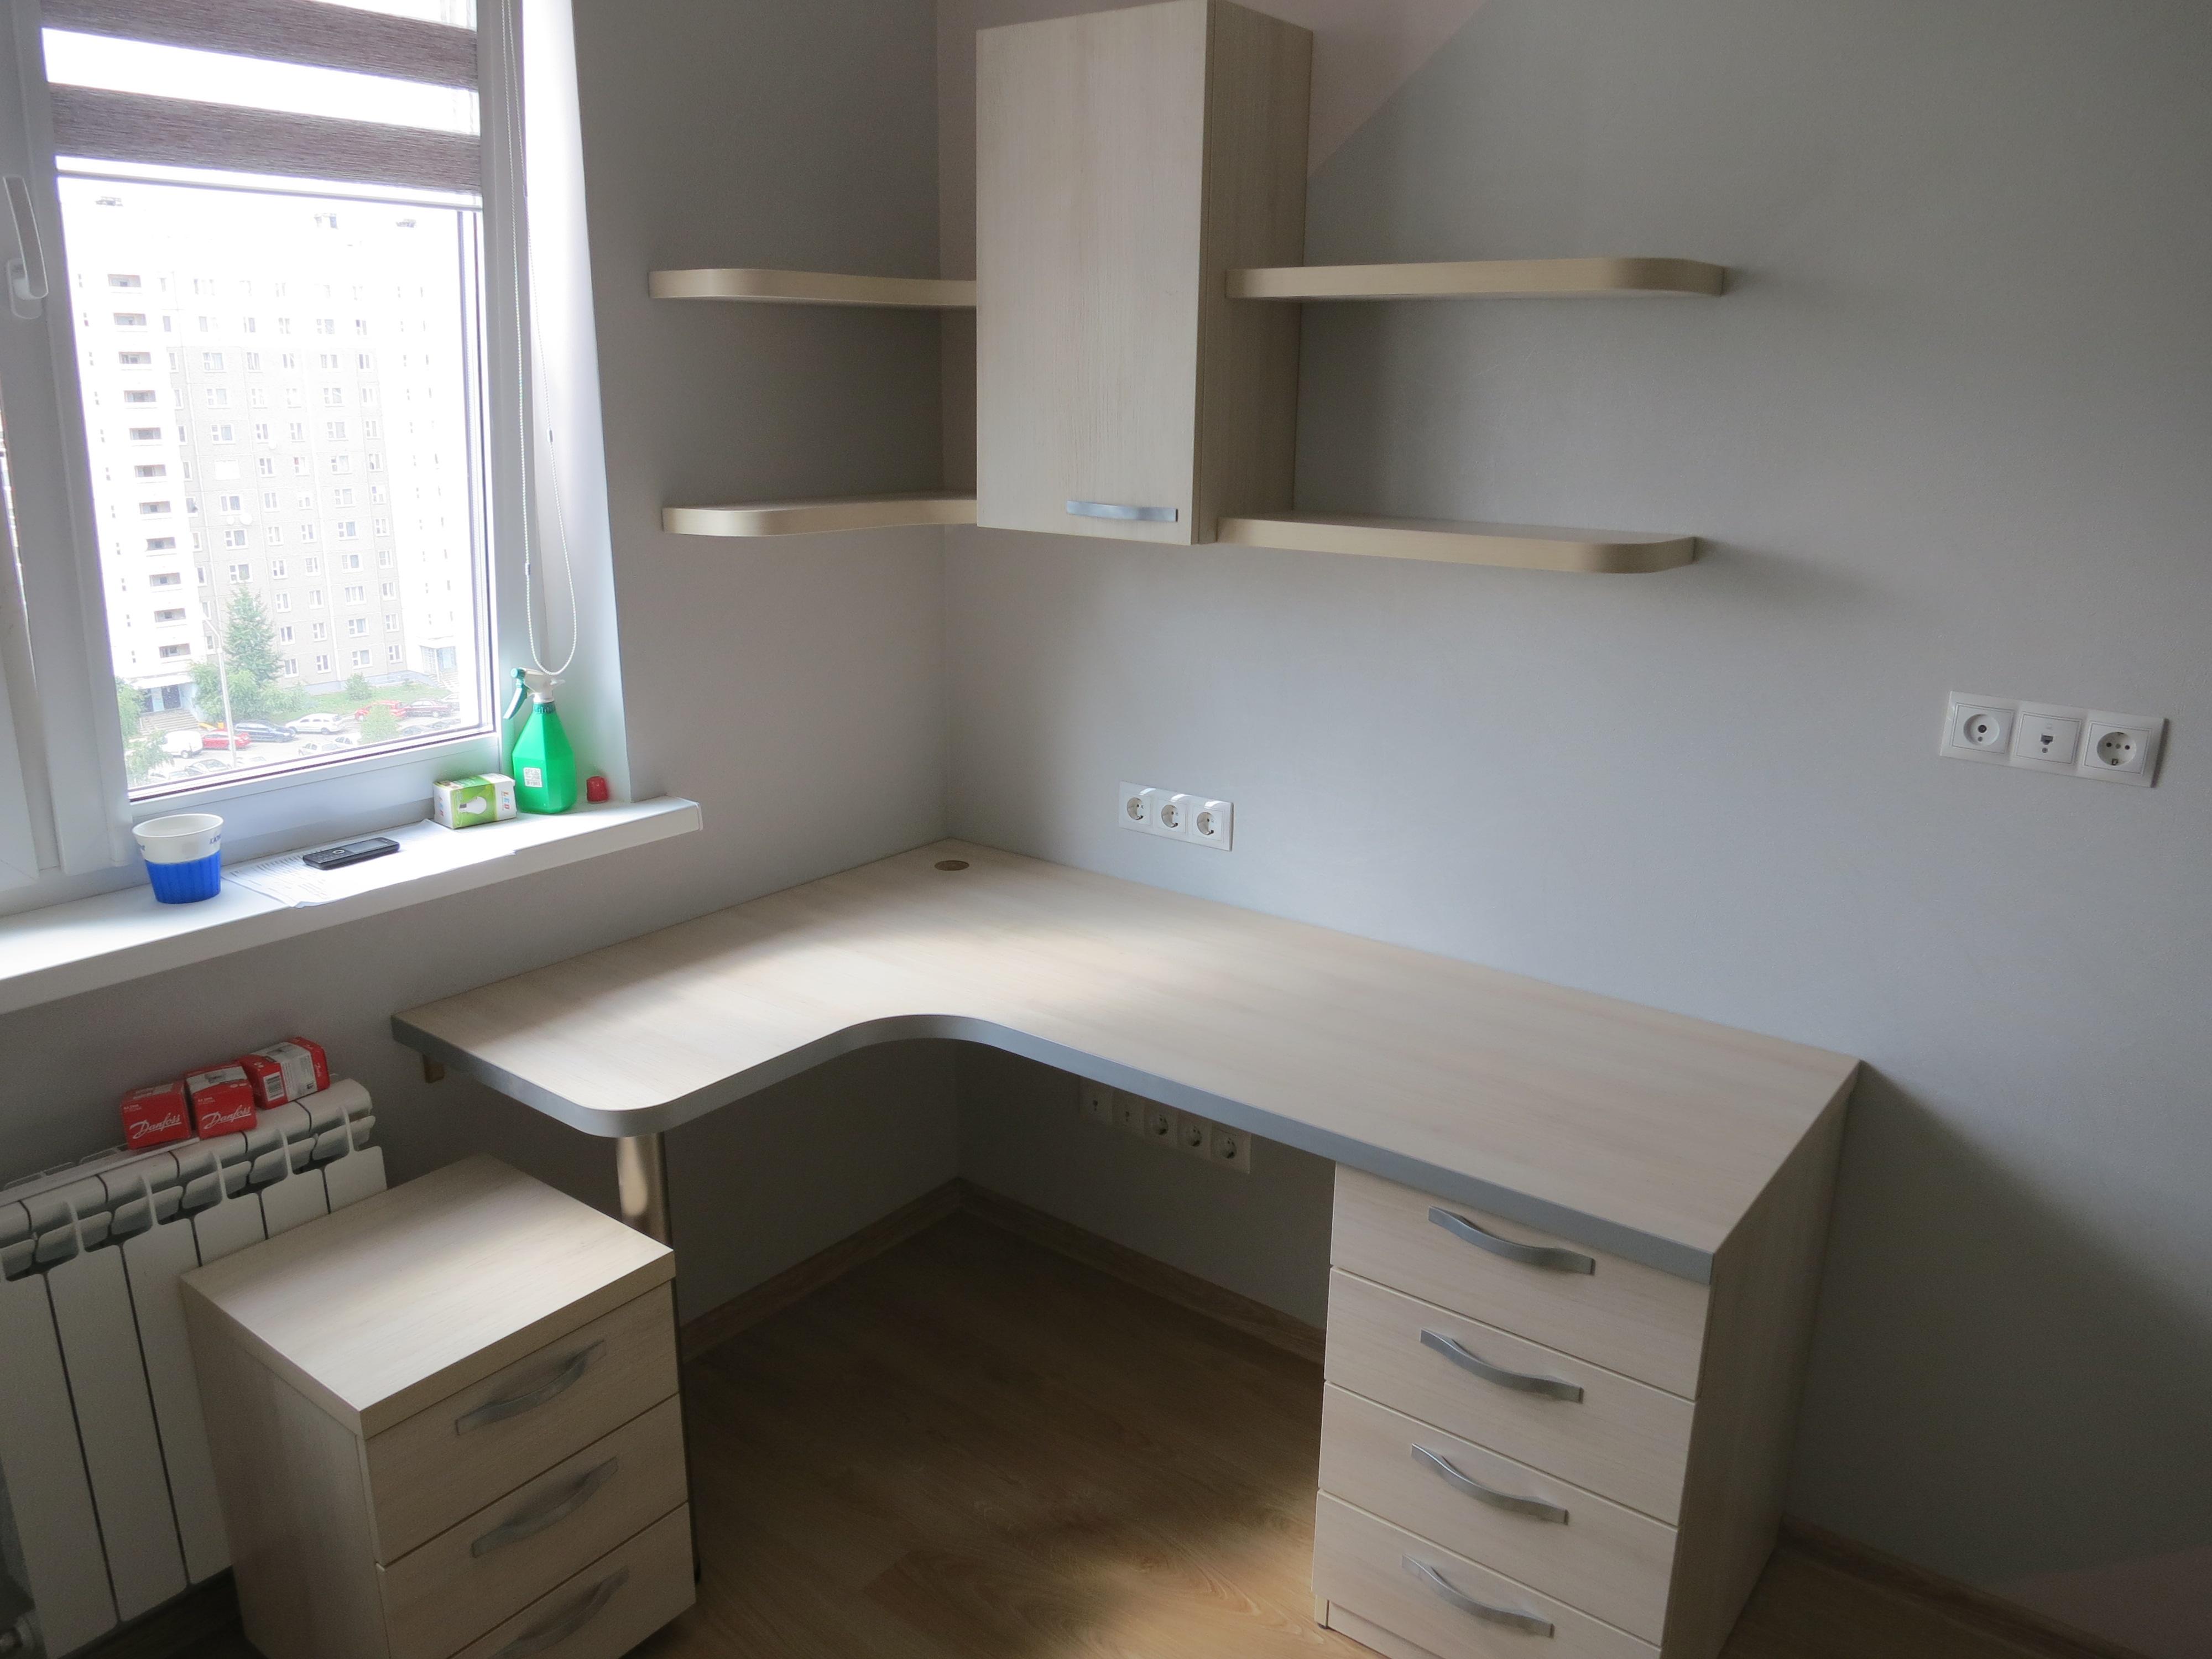 Мебель для детской комнаты под заказ - барахолка onliner.by.